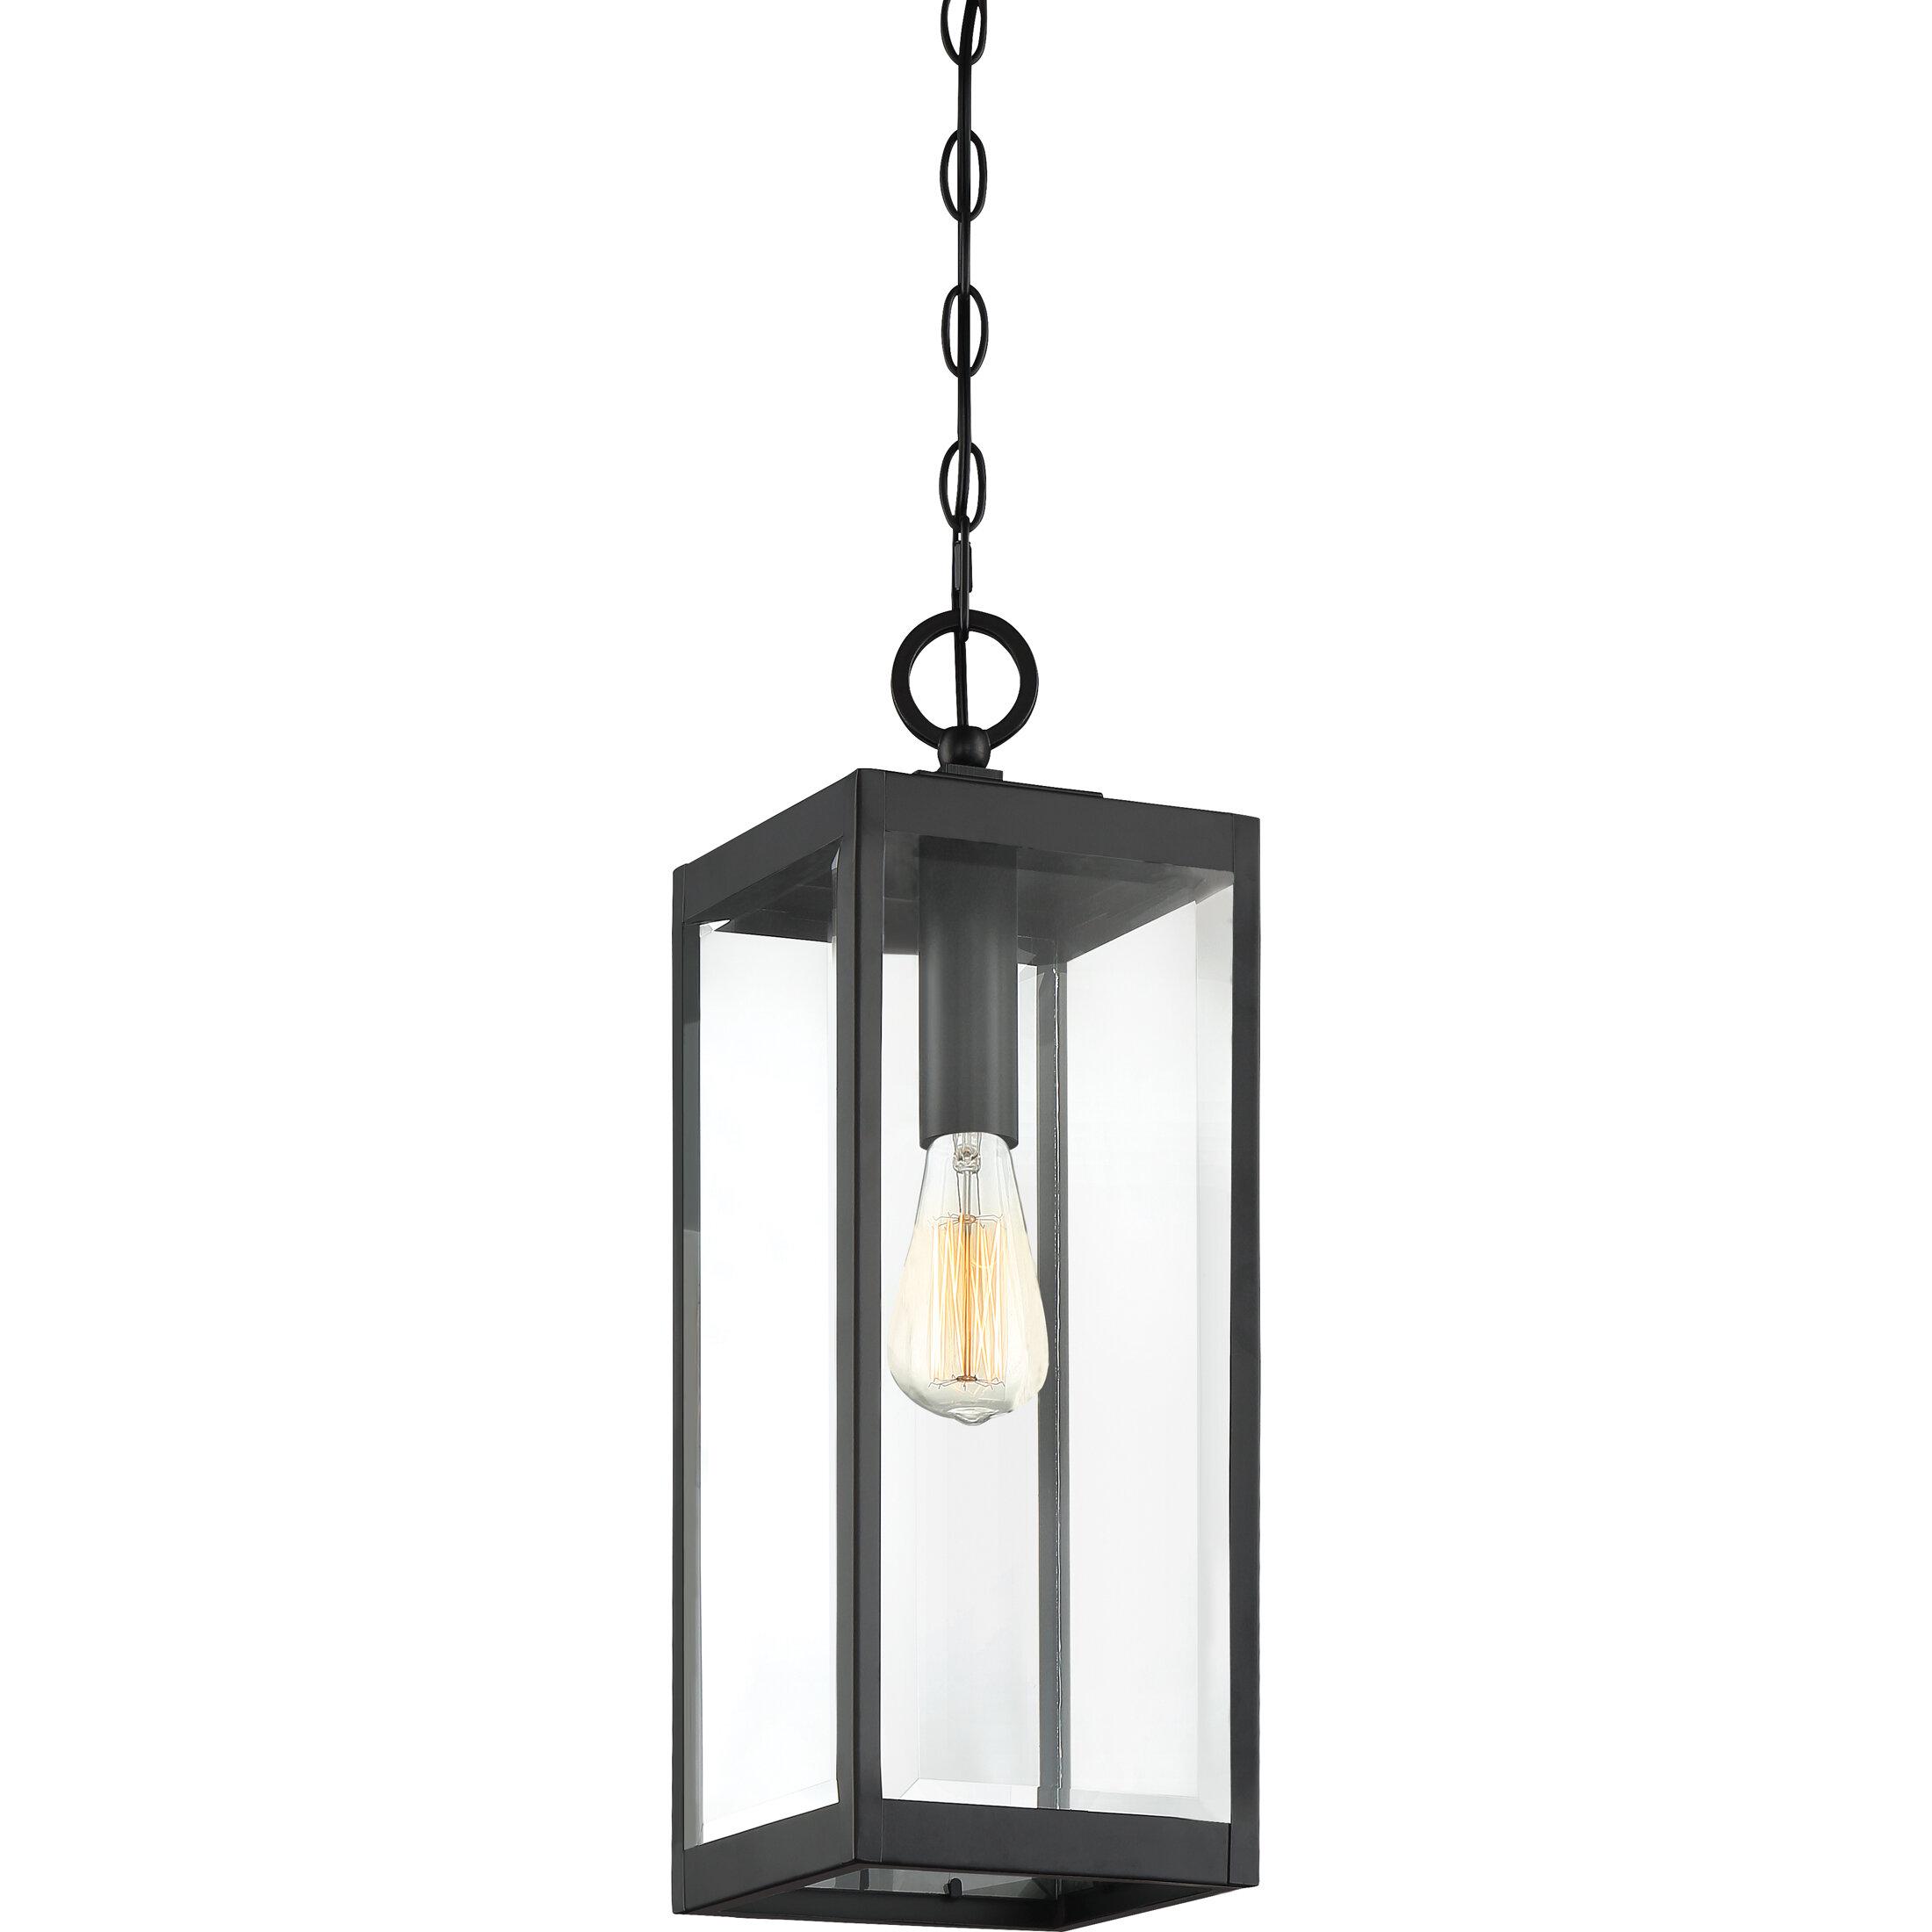 Exterior Pendant Light Fixtures Outdoor Hanging Lantern Black Front Entry Porch